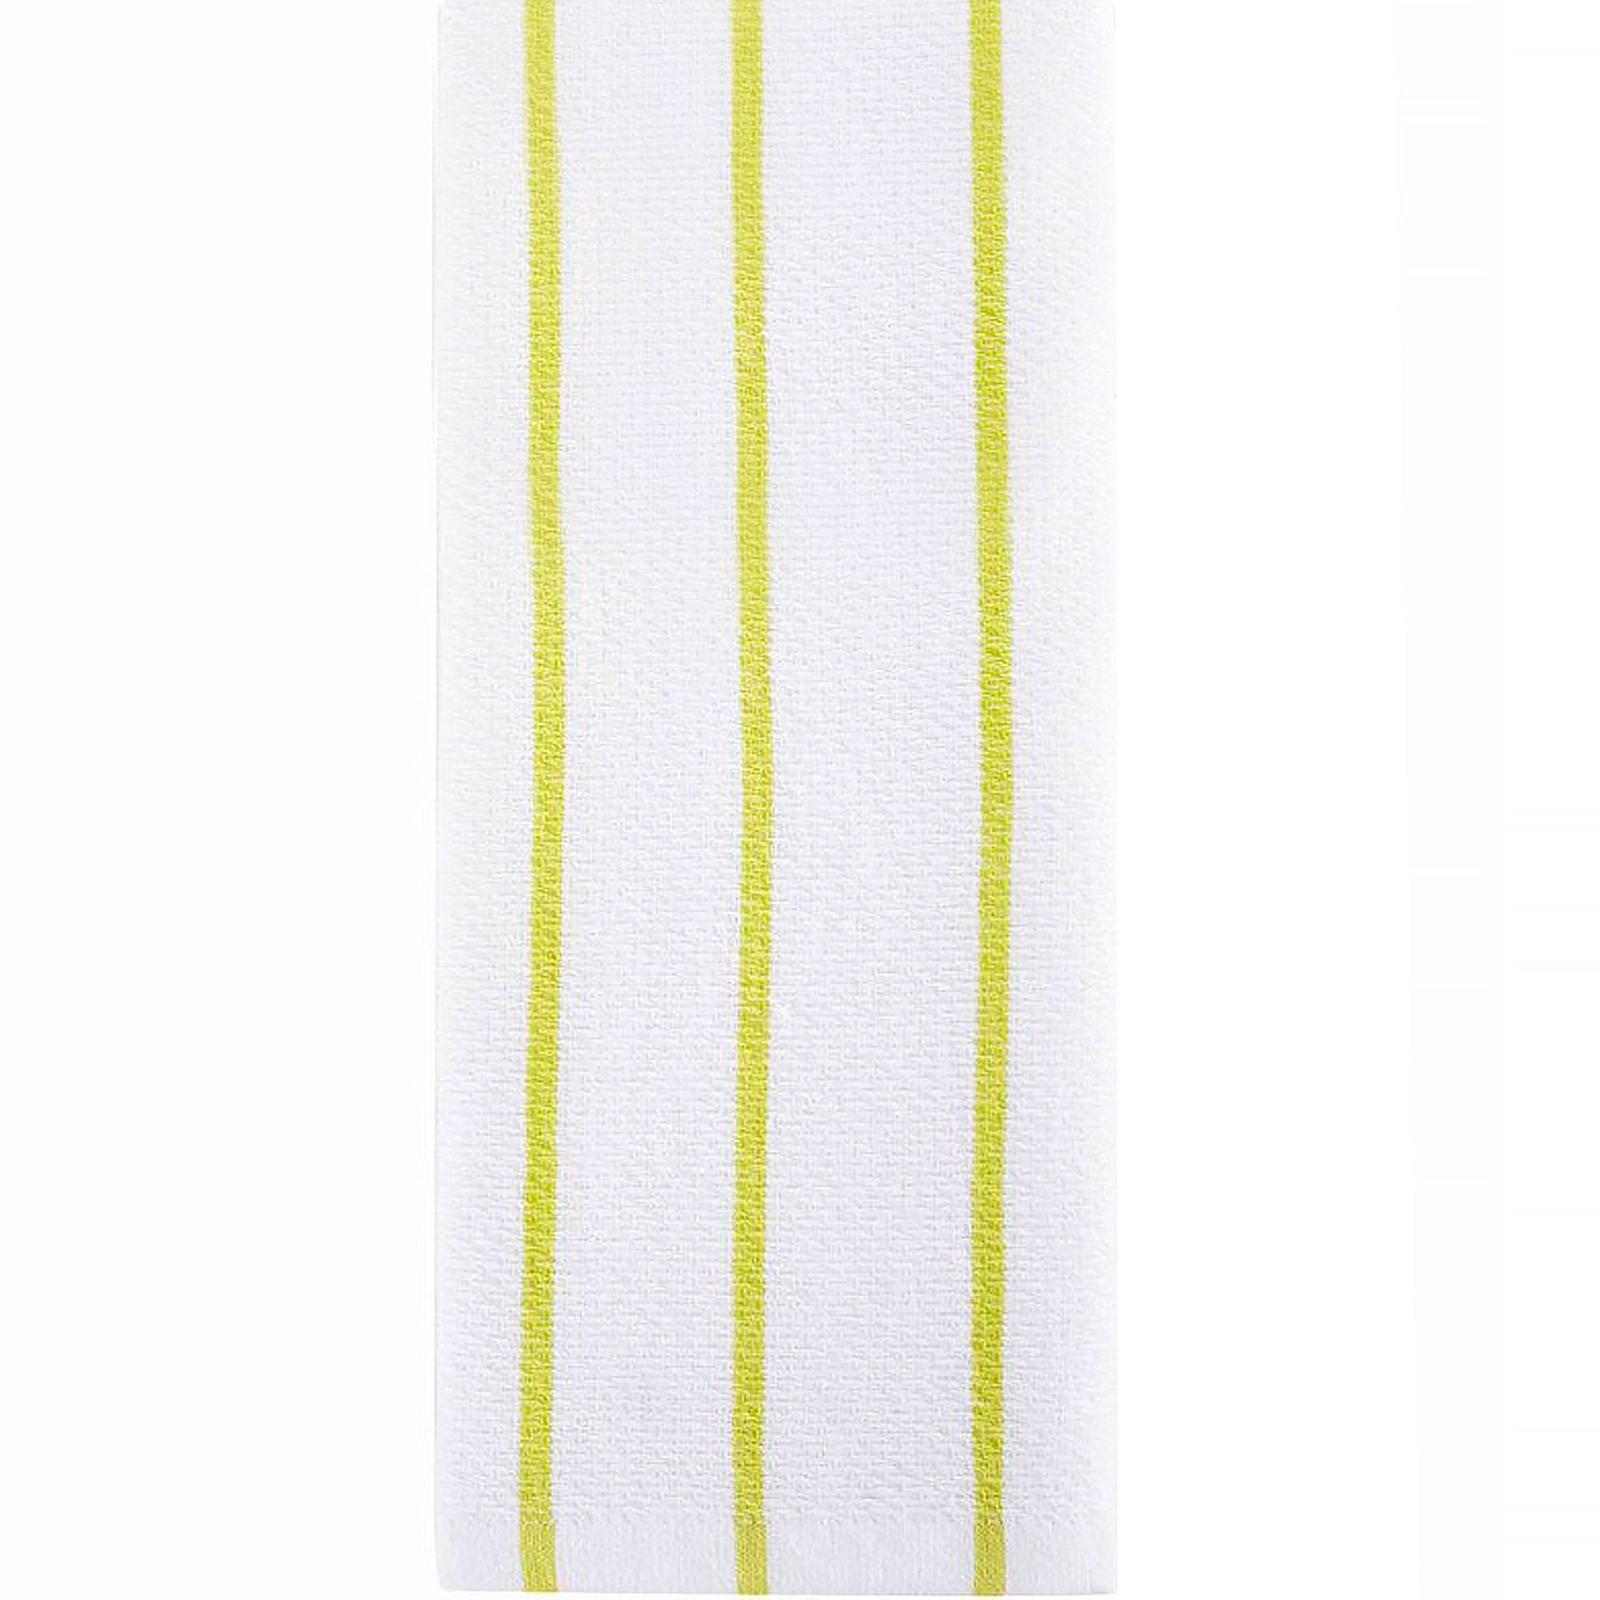 Full Circle, Hue, Modern Kitchen Towels, Lime Stripes, 1 Towel, 15 ...